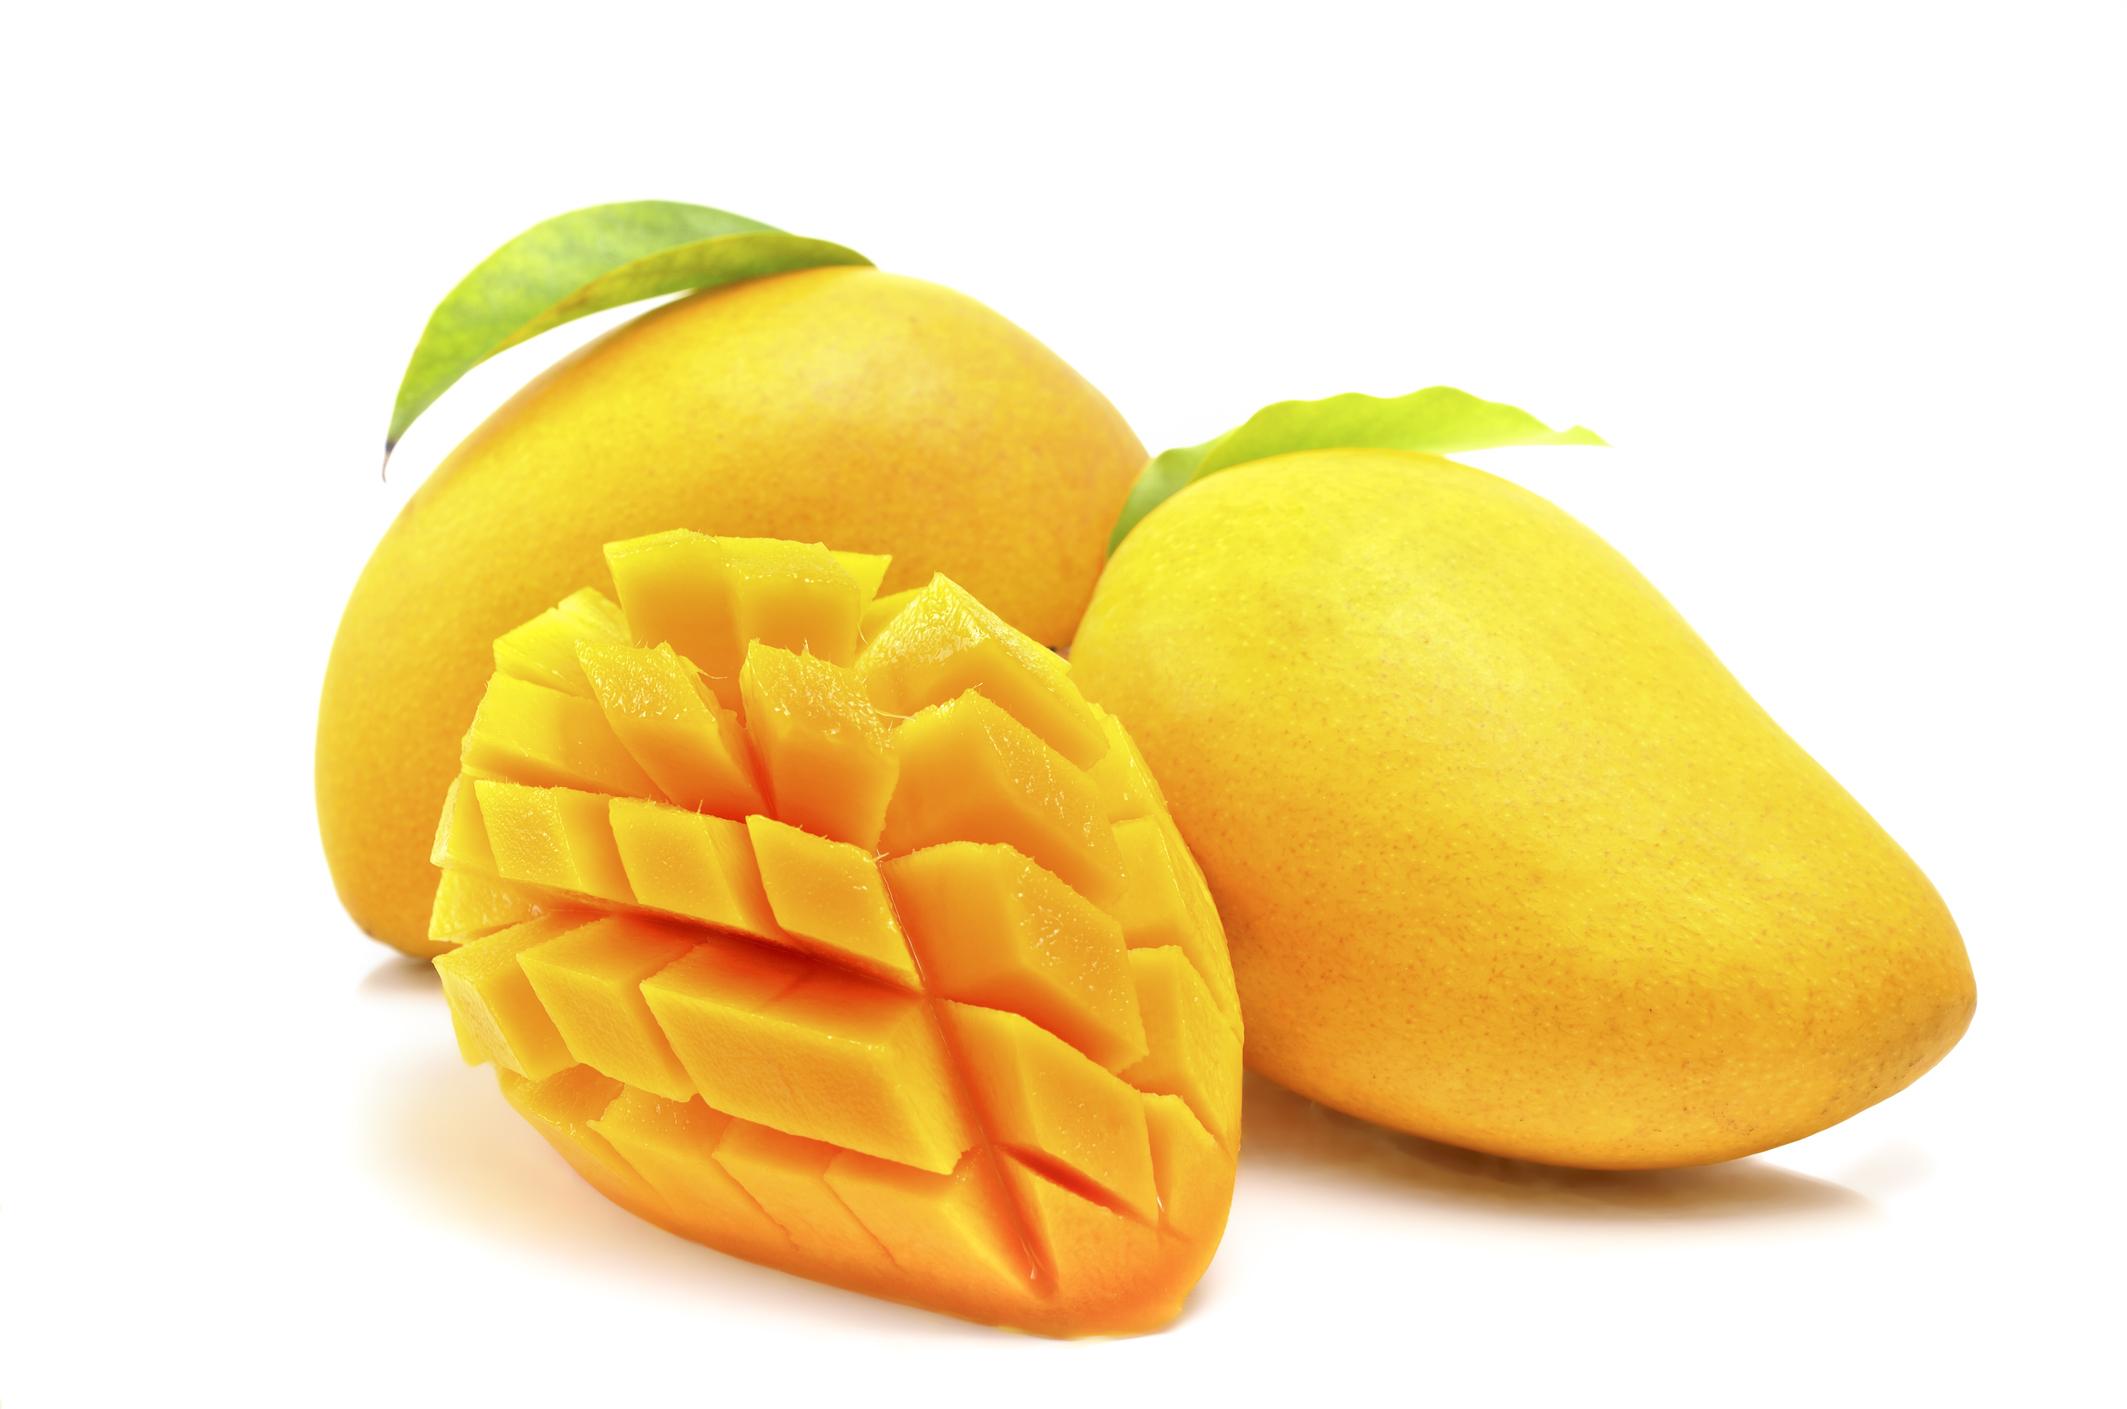 Honey Mangoes (Ataulfo)